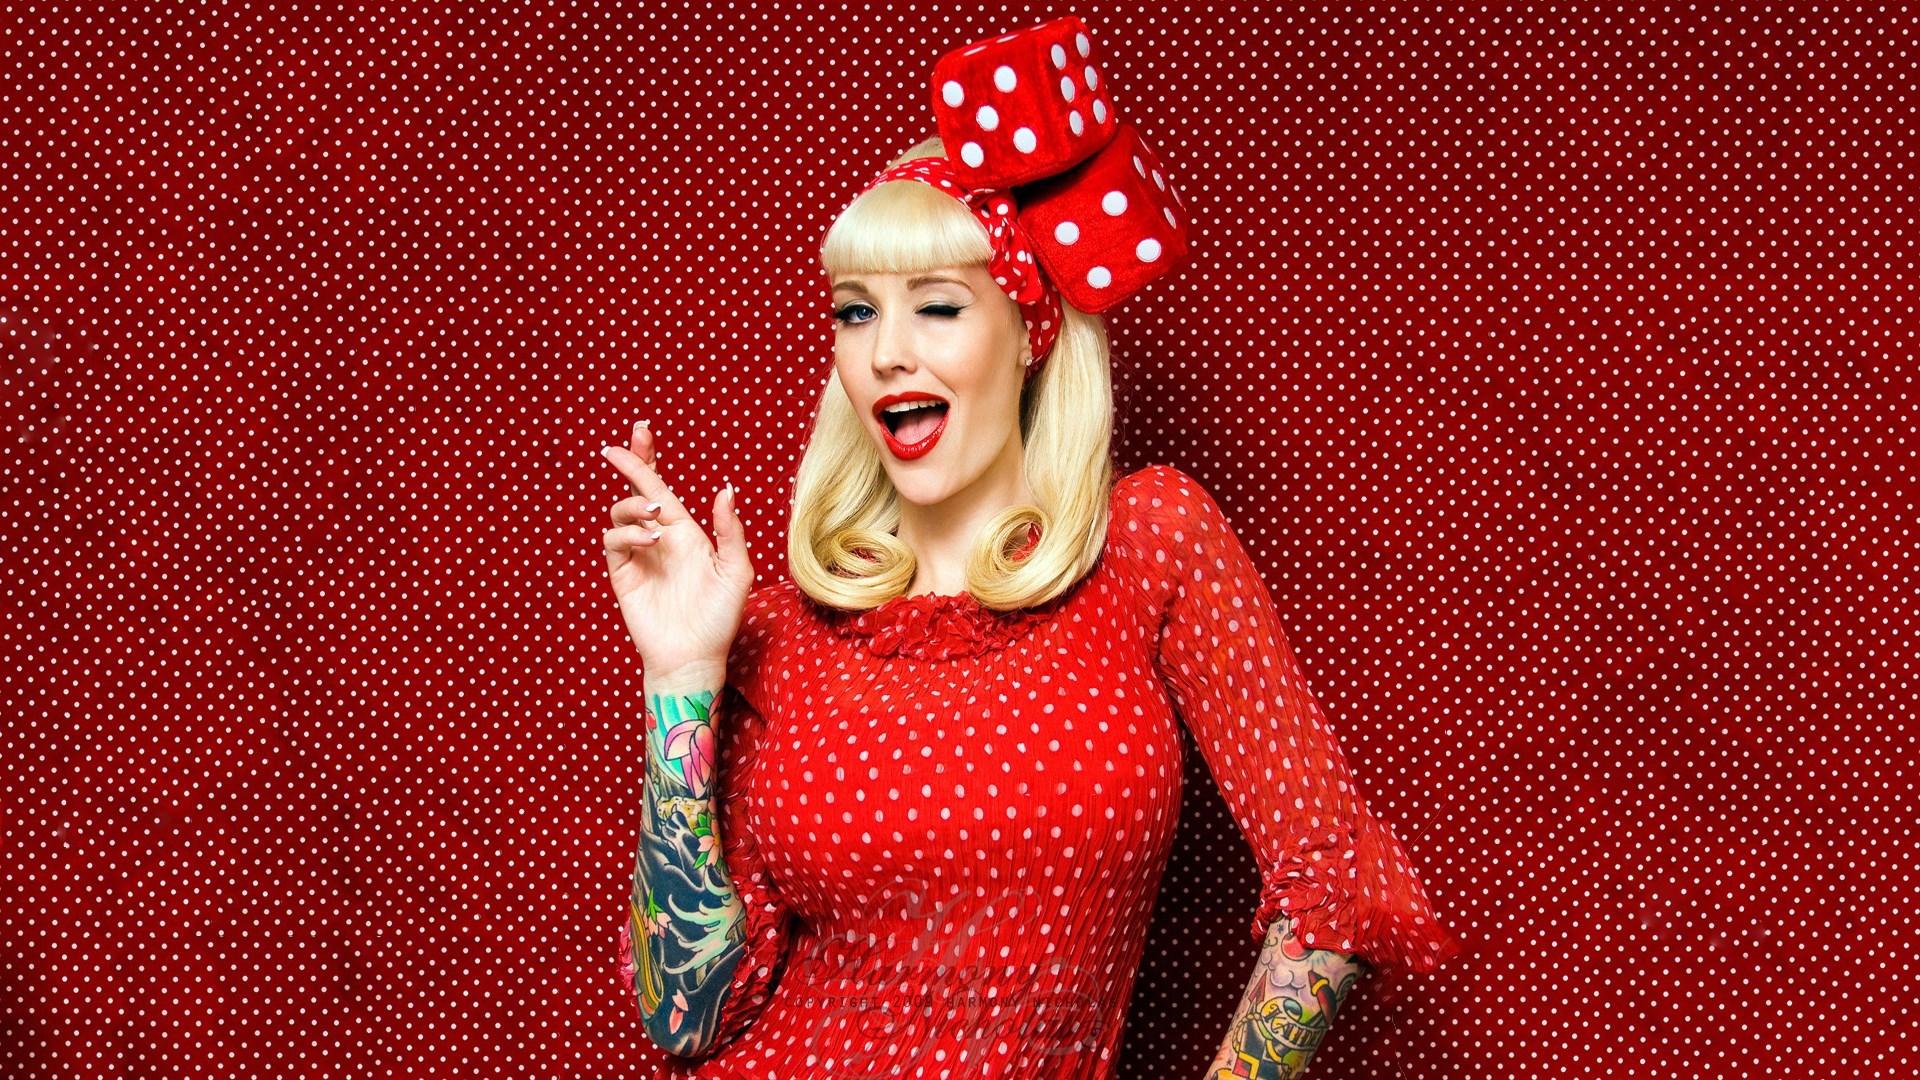 Beautiful Blonde Girl Tattoos Red